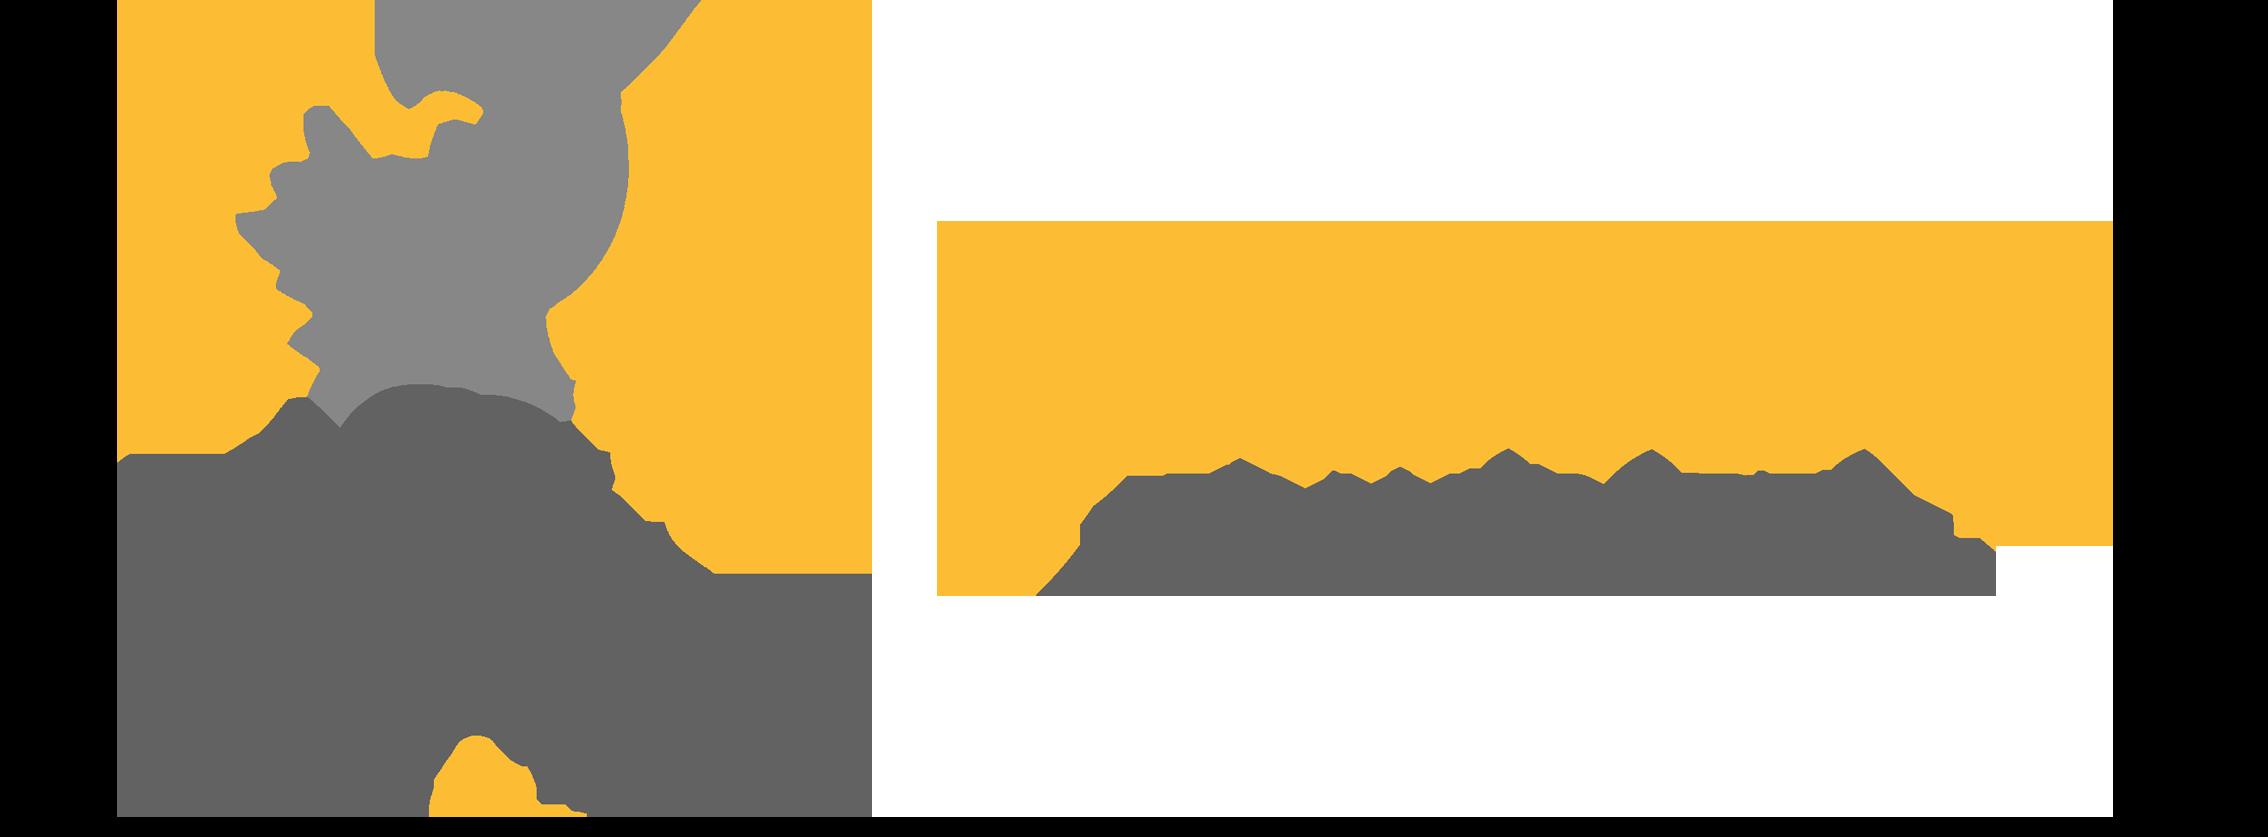 Griffins Transports